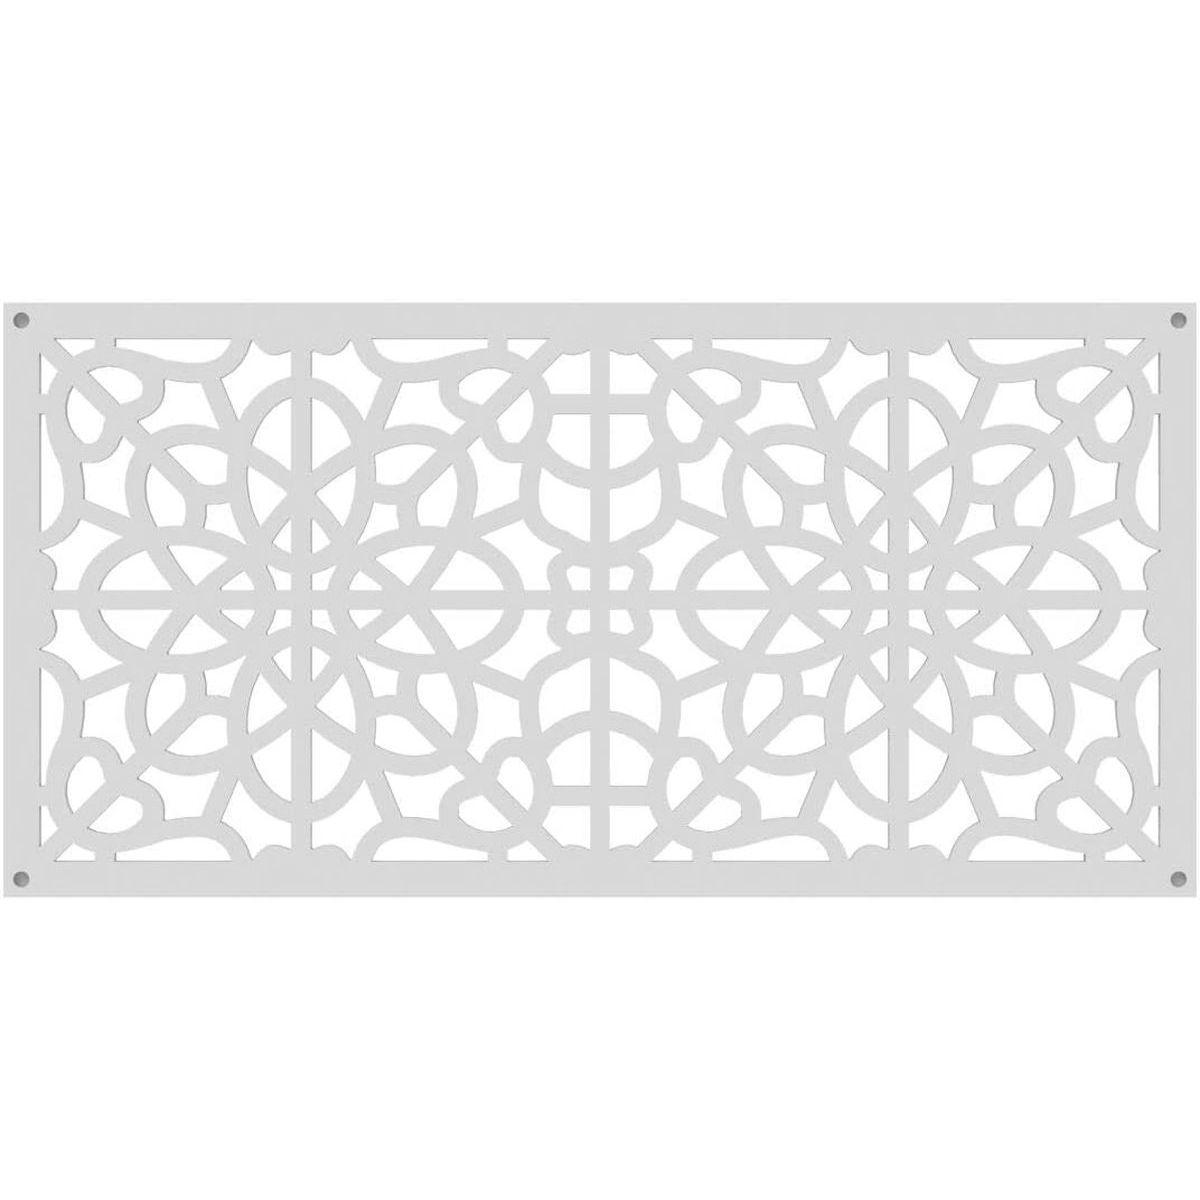 RDI 73004785 Fretwork Decorative Screen Panels - White